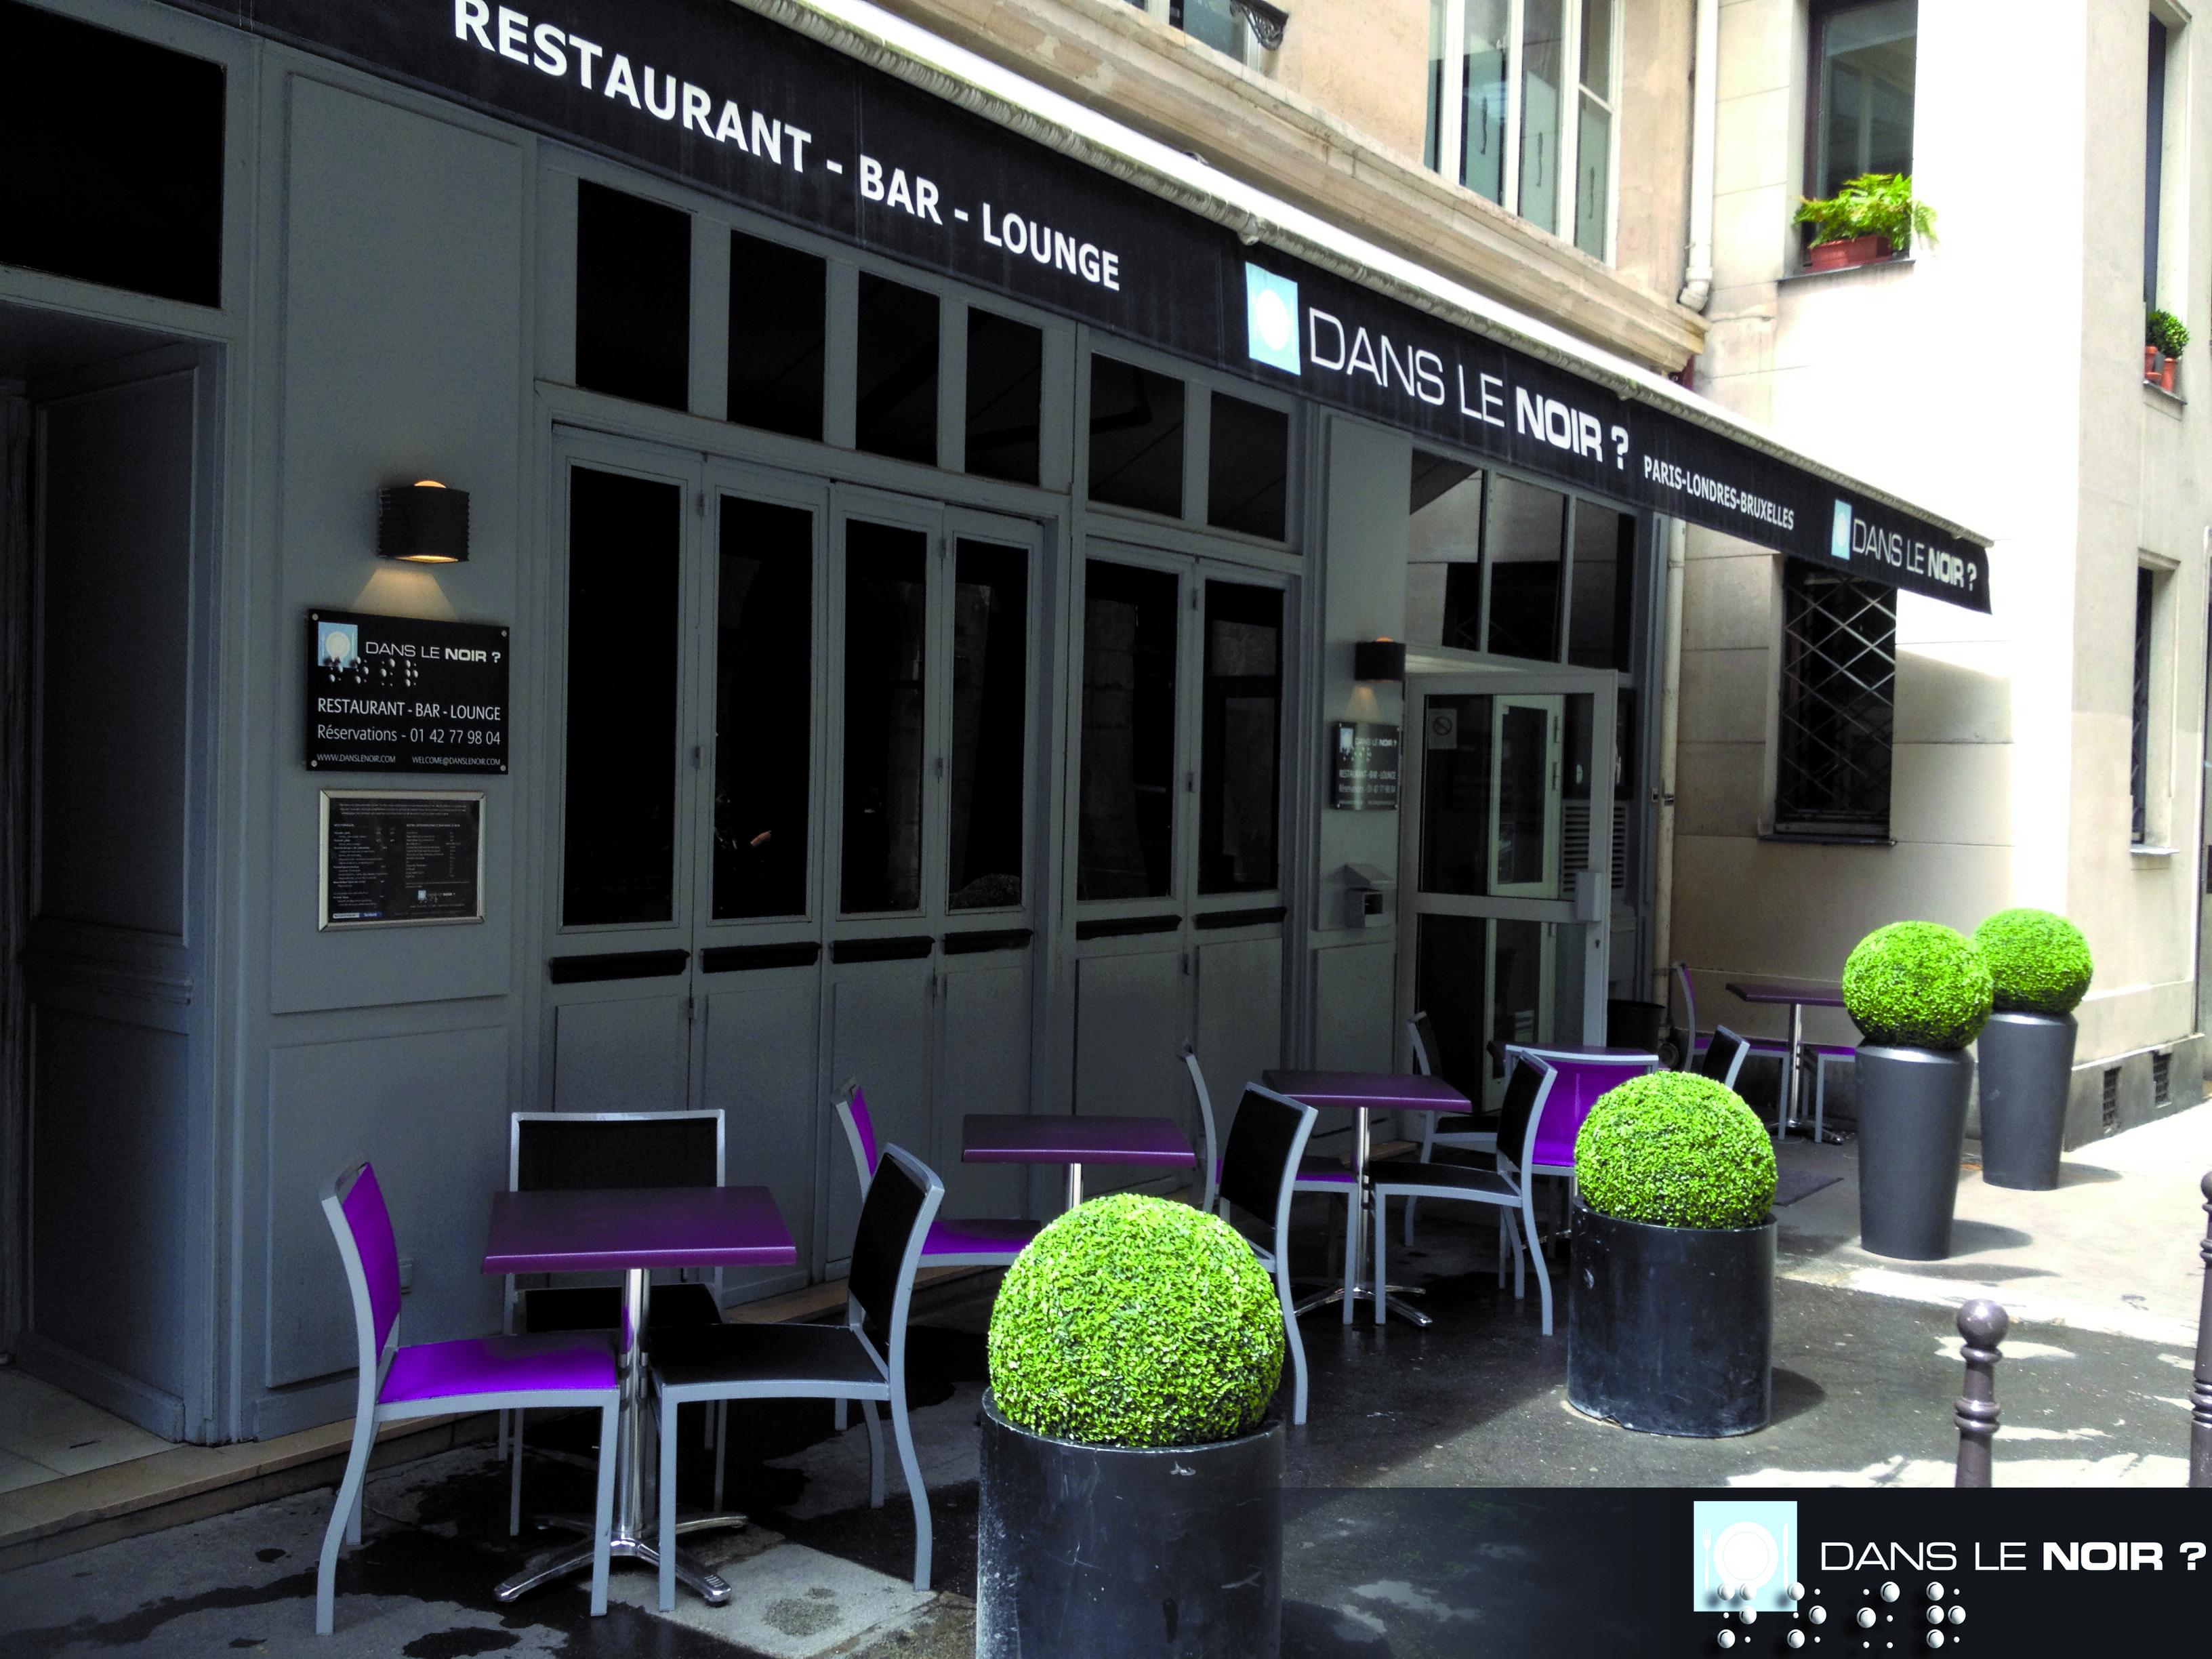 5-unusual-places-to-eat-in-paris-4